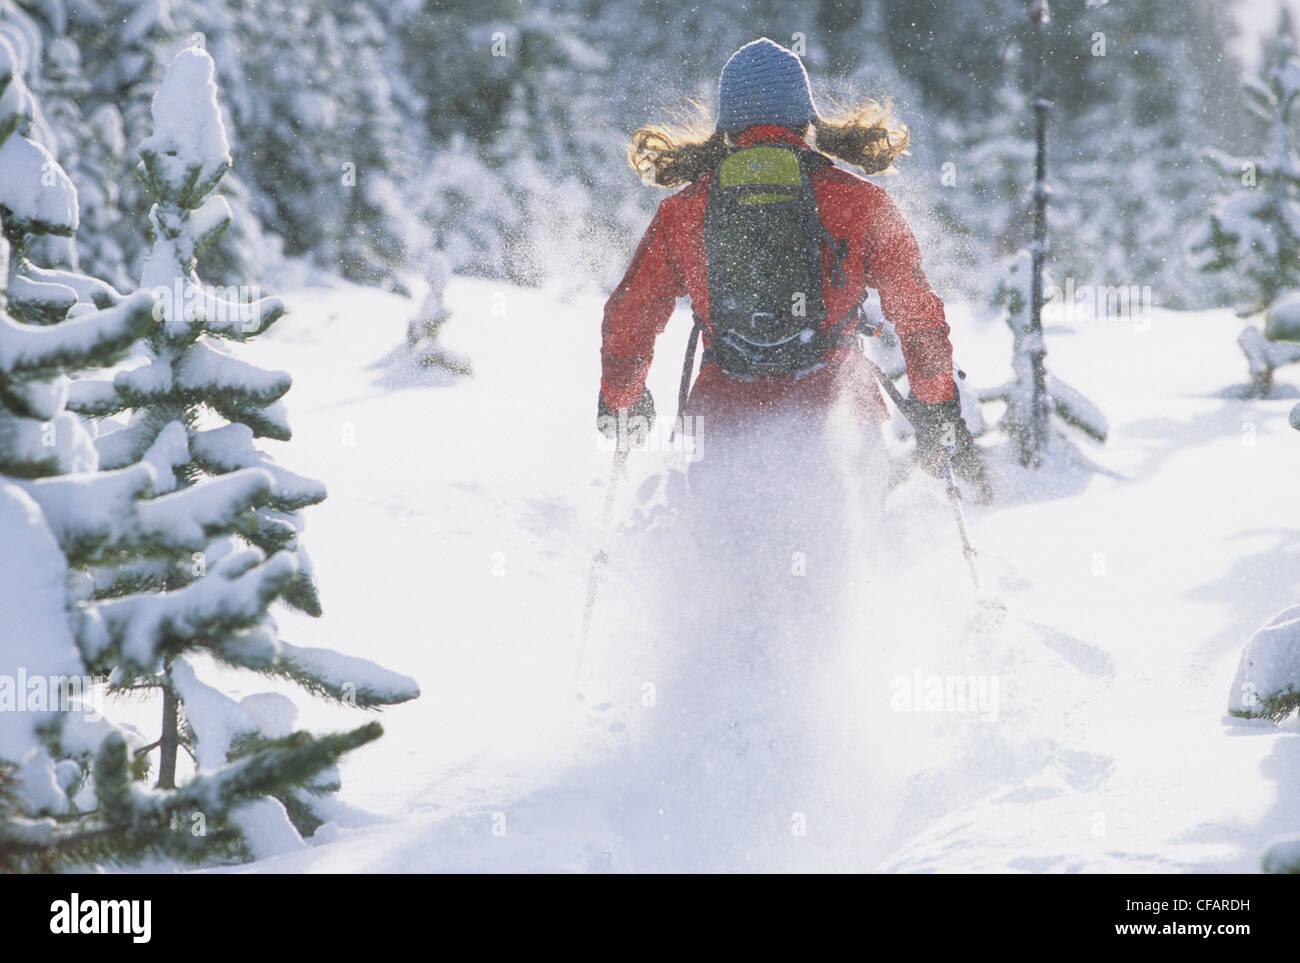 A young female snowshoer enjoying a winter morning run in Kananaskis Country, Alberta, Canada - Stock Image